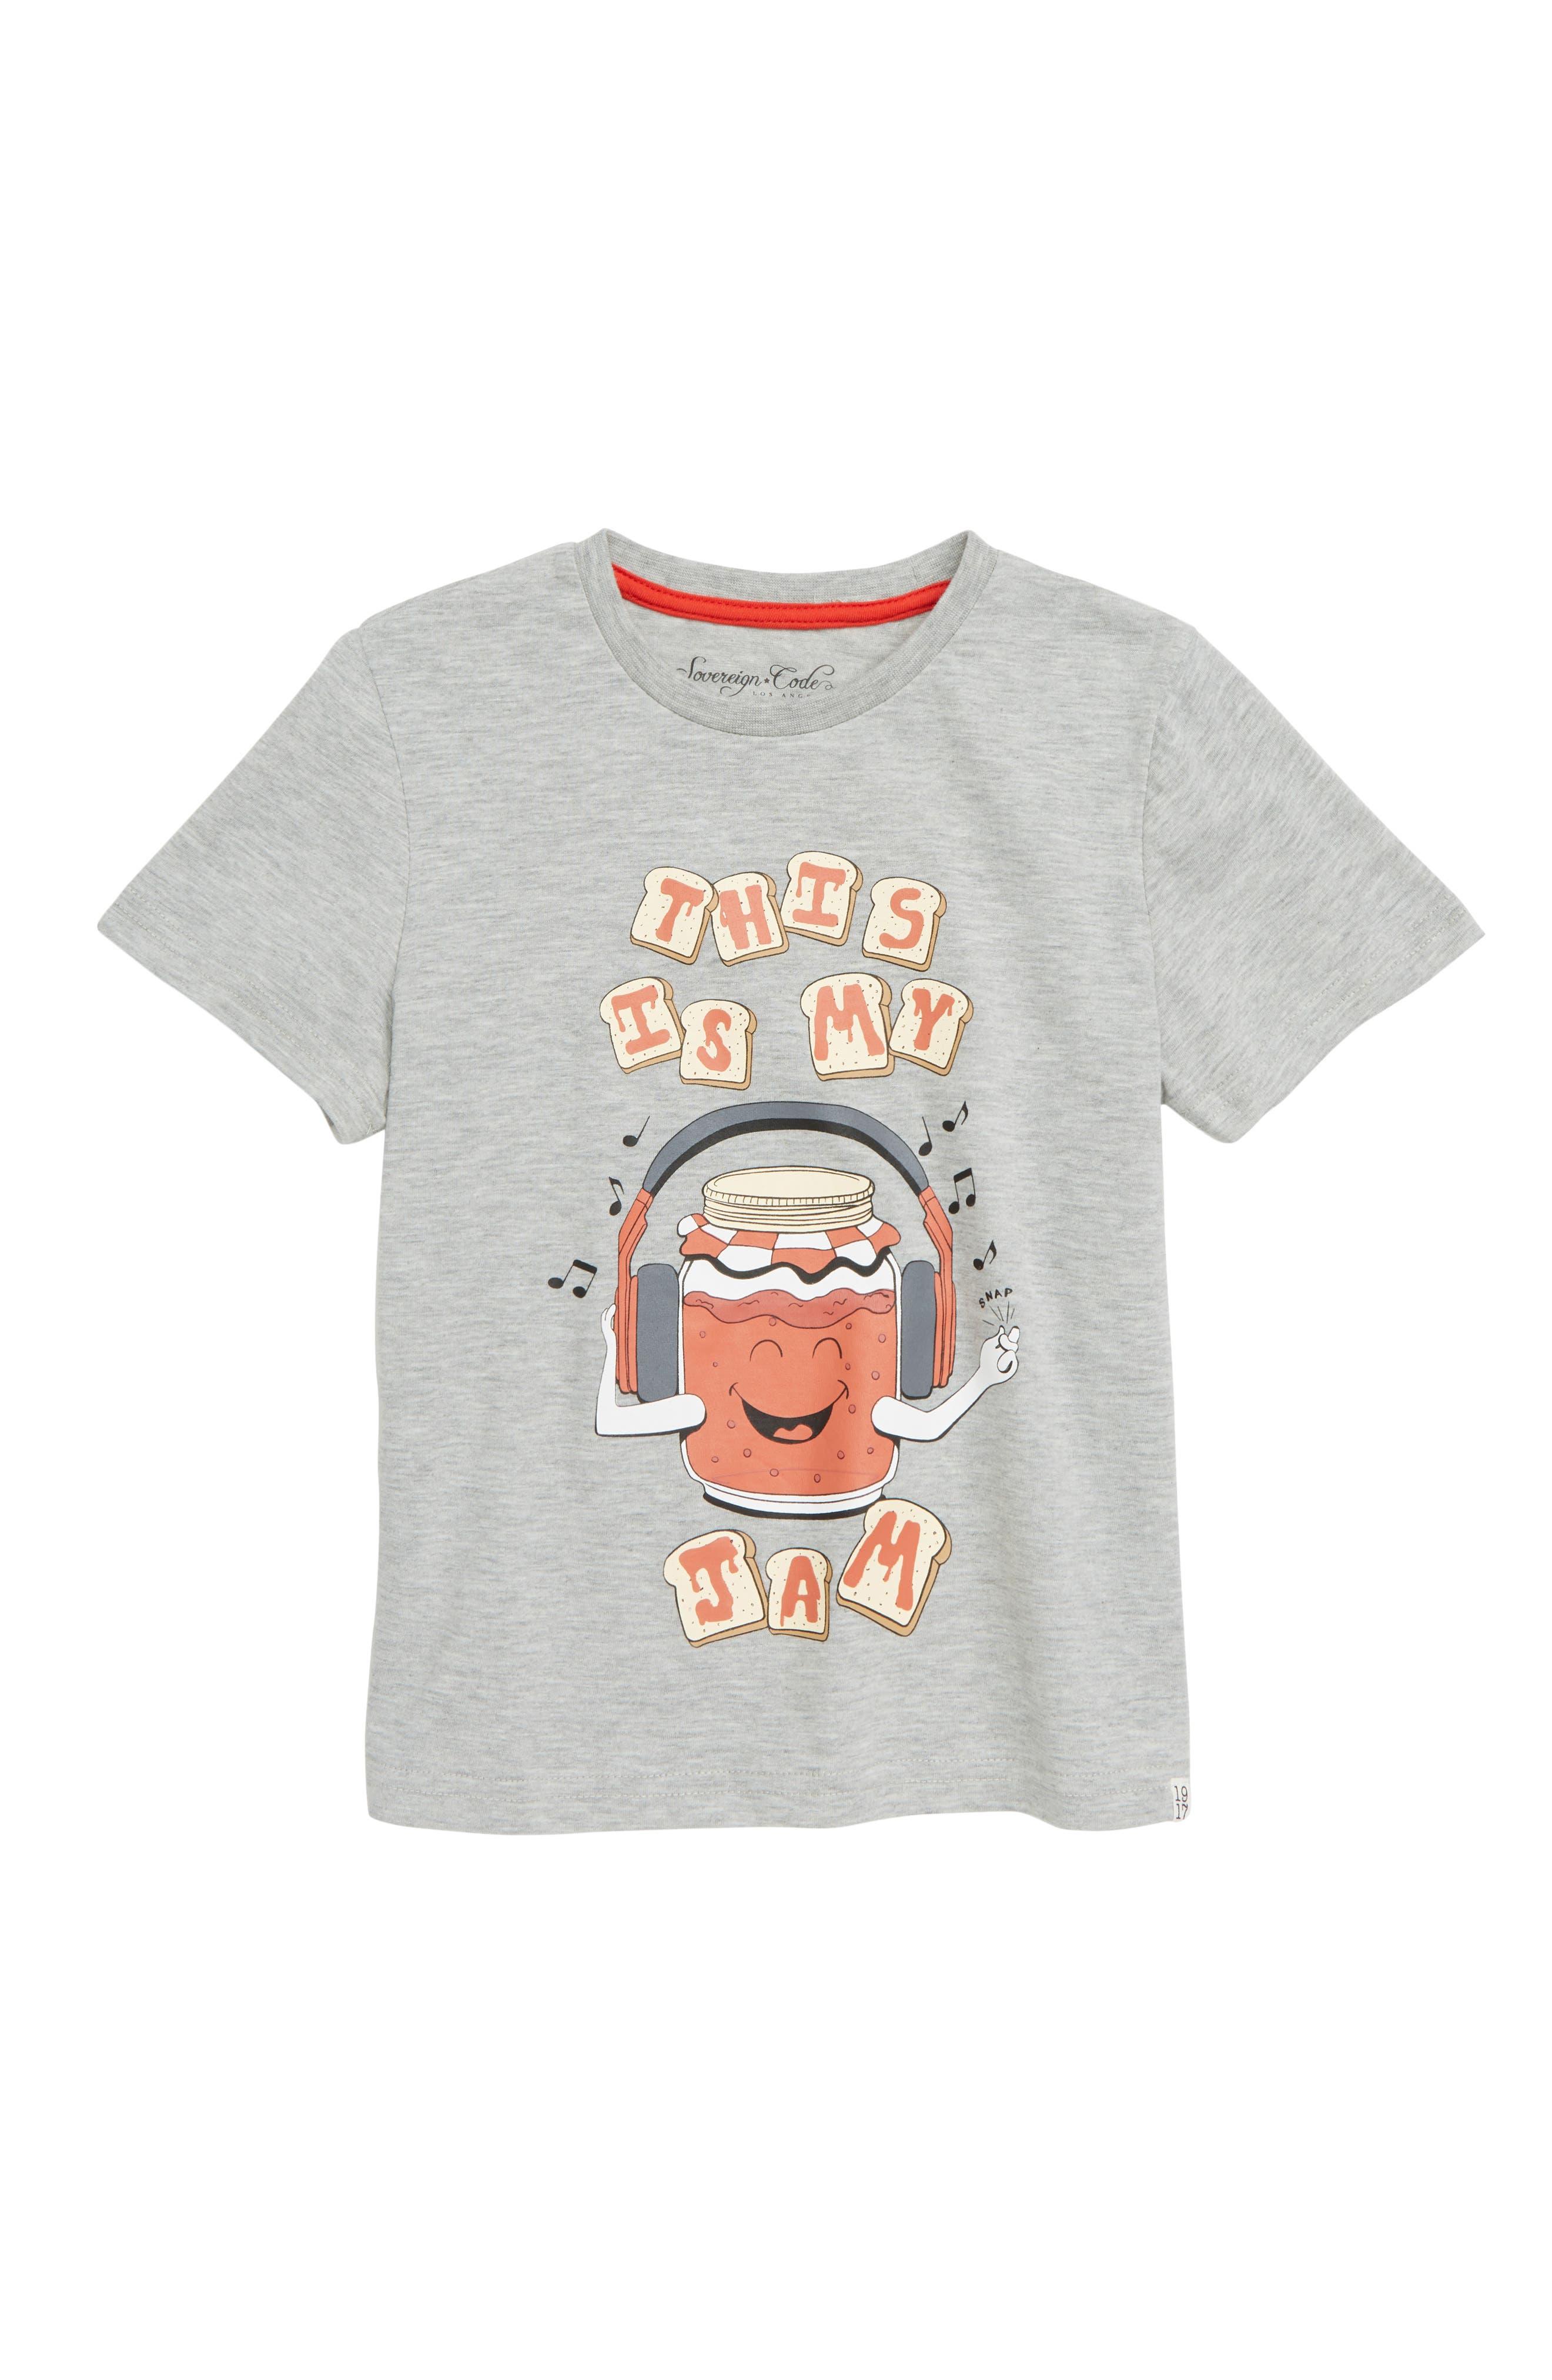 SOVEREIGN CODE,                             Rome Bronuts Graphic T-Shirt,                             Main thumbnail 1, color,                             050